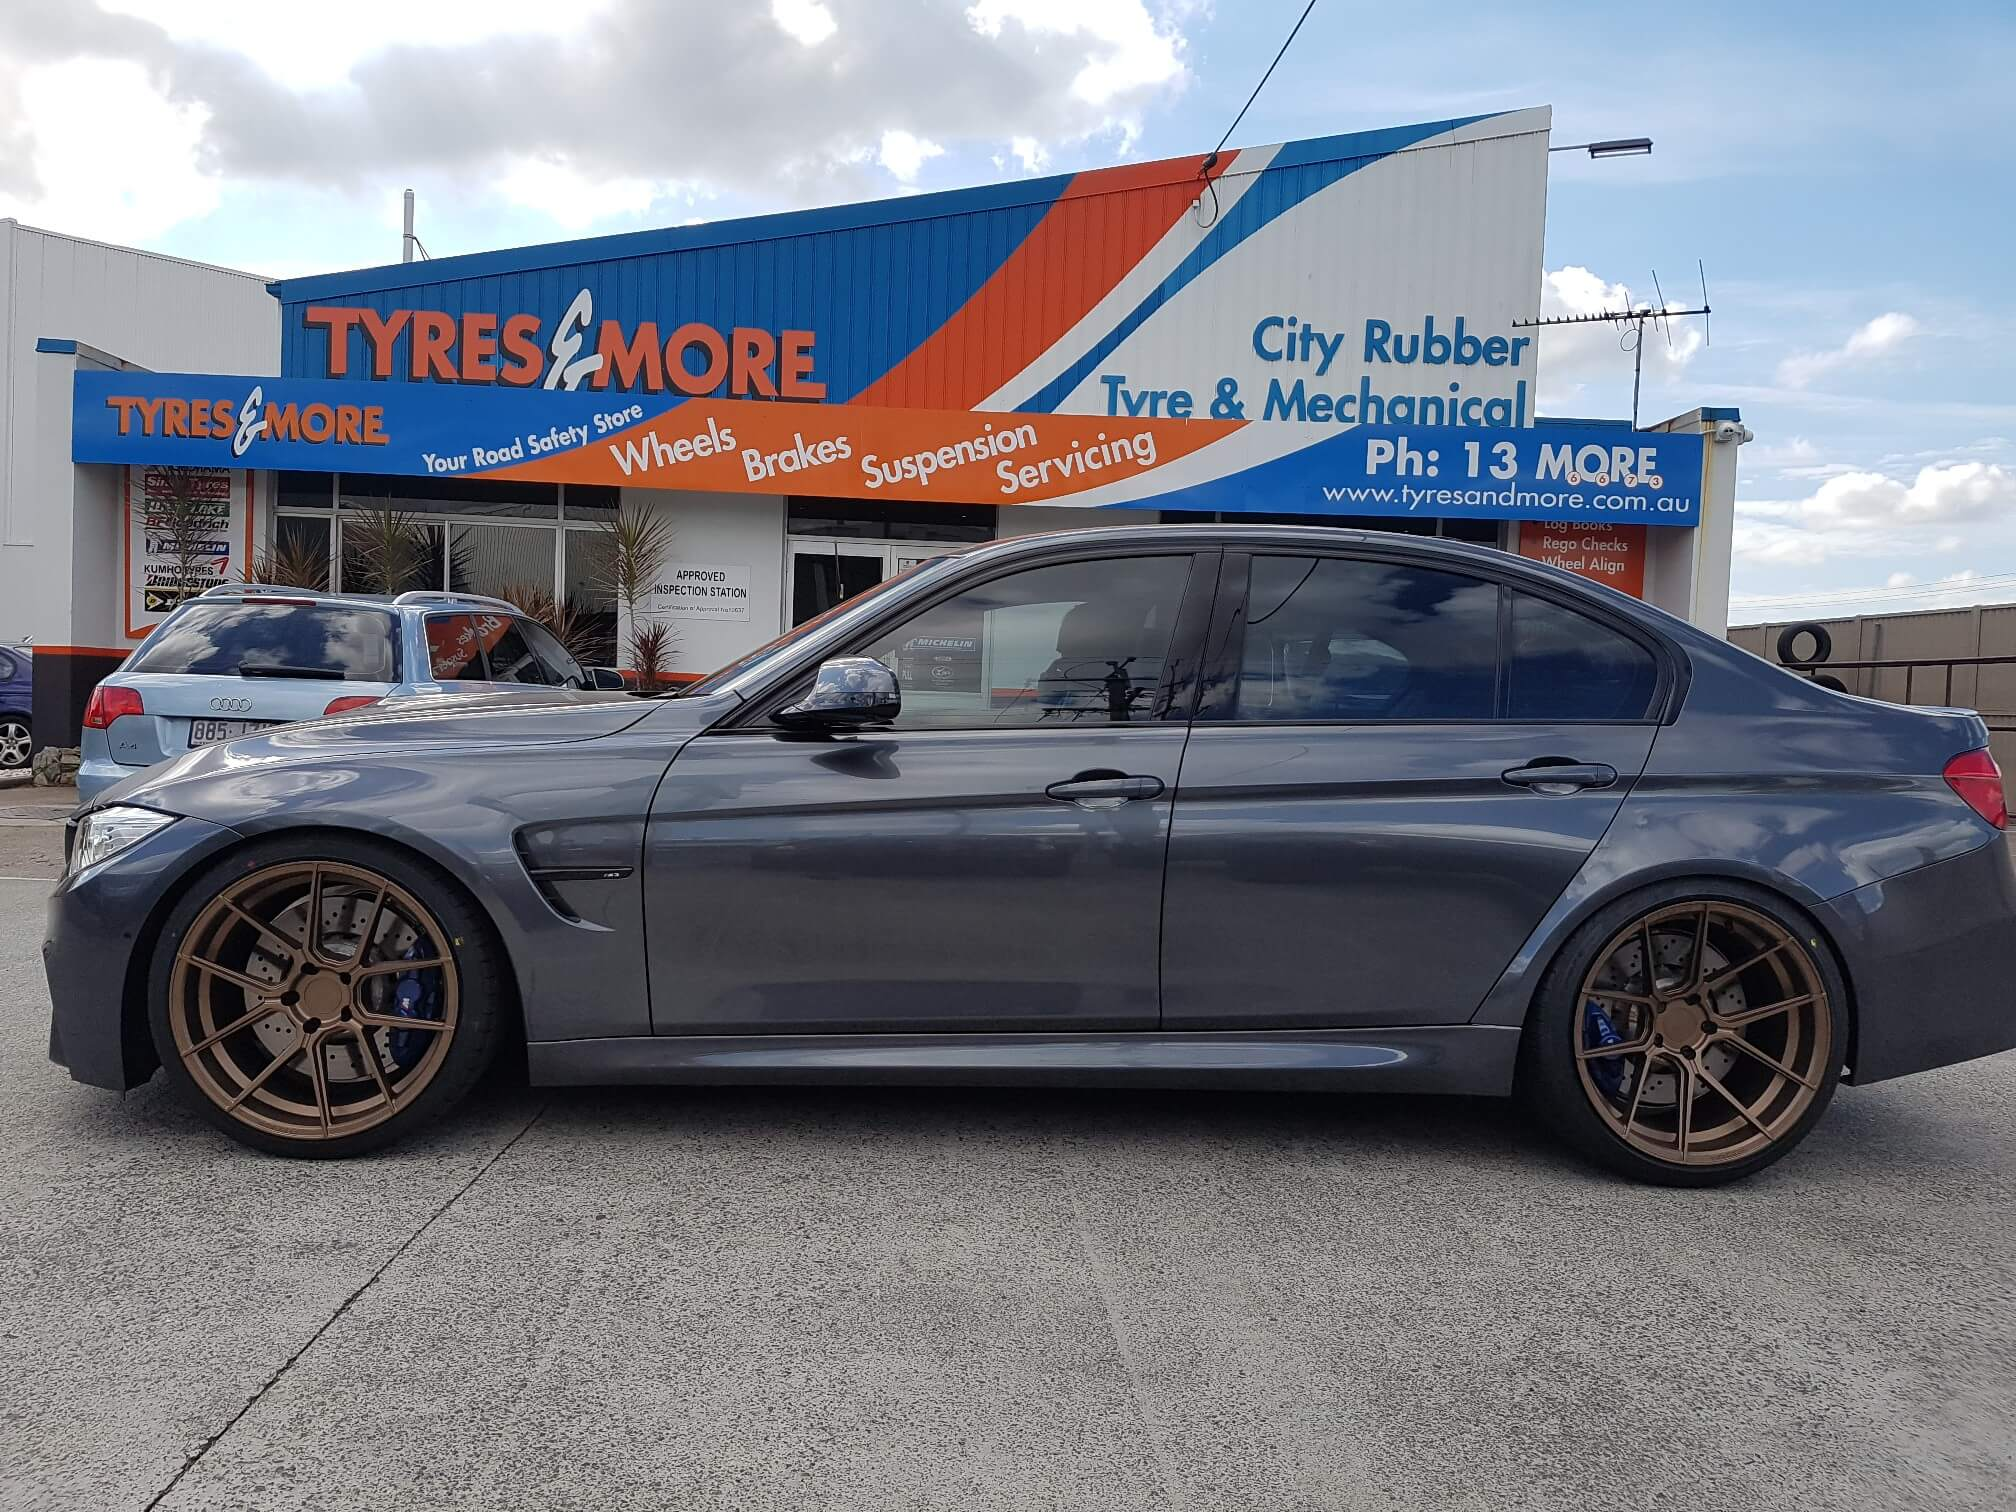 Unique Car Gallery - City Rubber Tyres & More